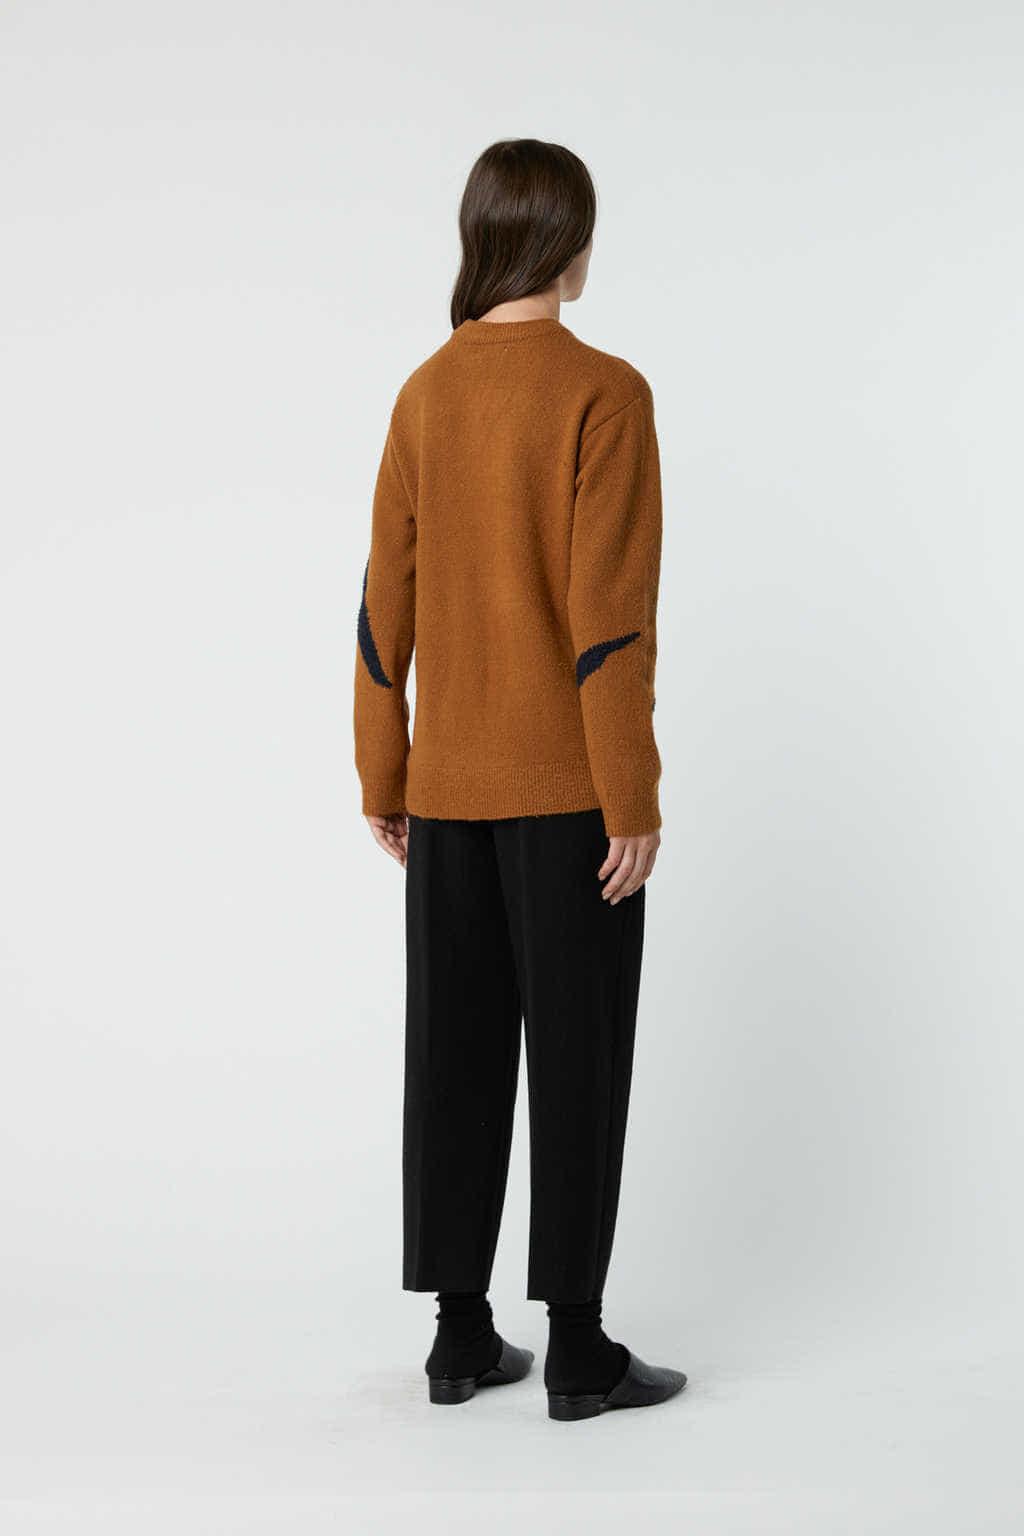 Sweater 2710 Mustard 4